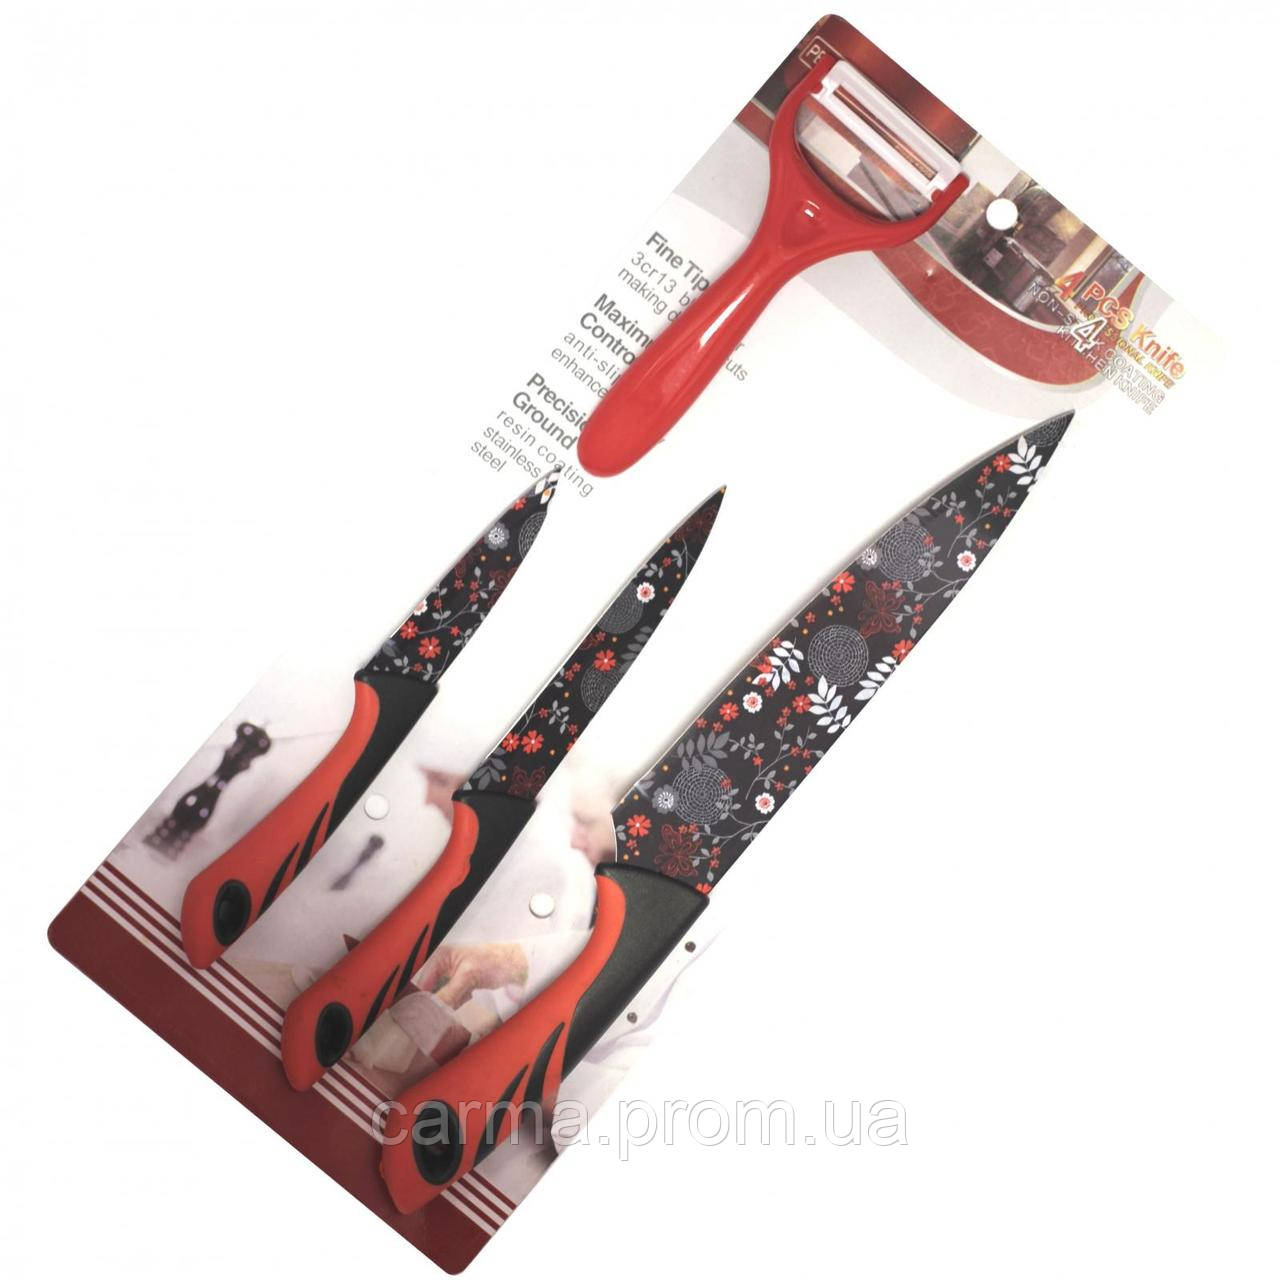 Набор ножей UNIQUE UN 1804 4 штуки